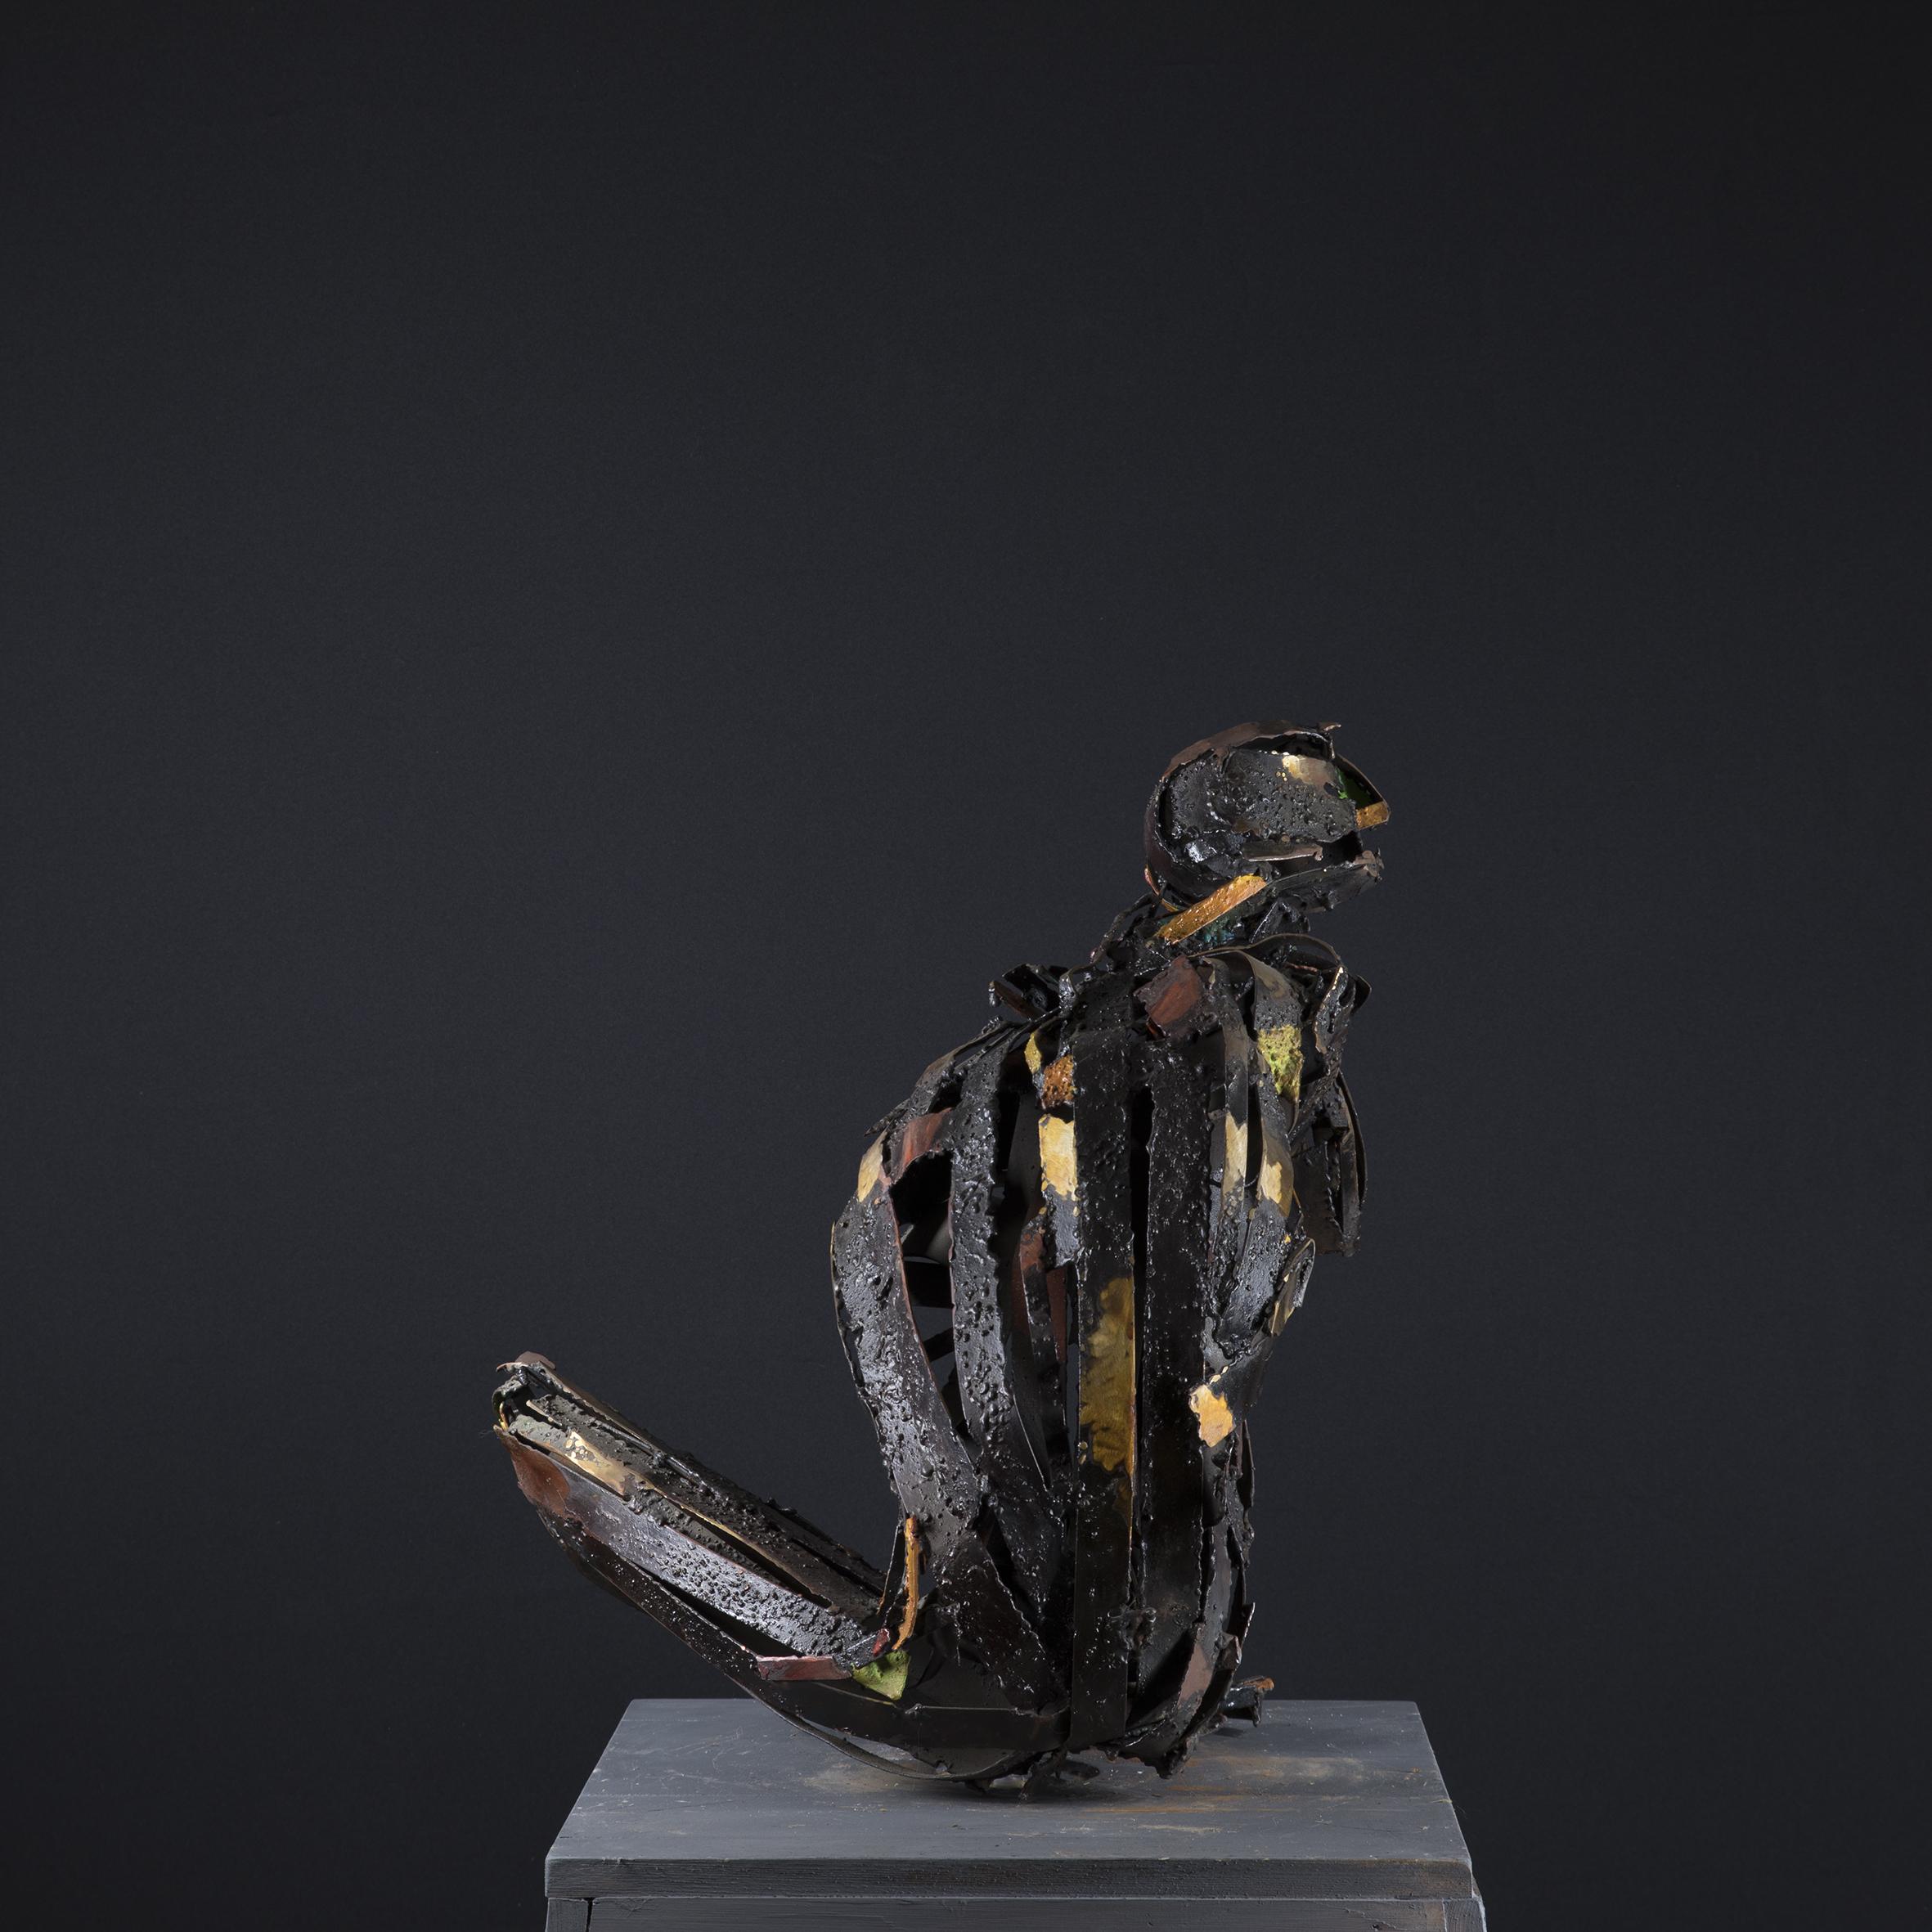 pensatore - works 1990-2003